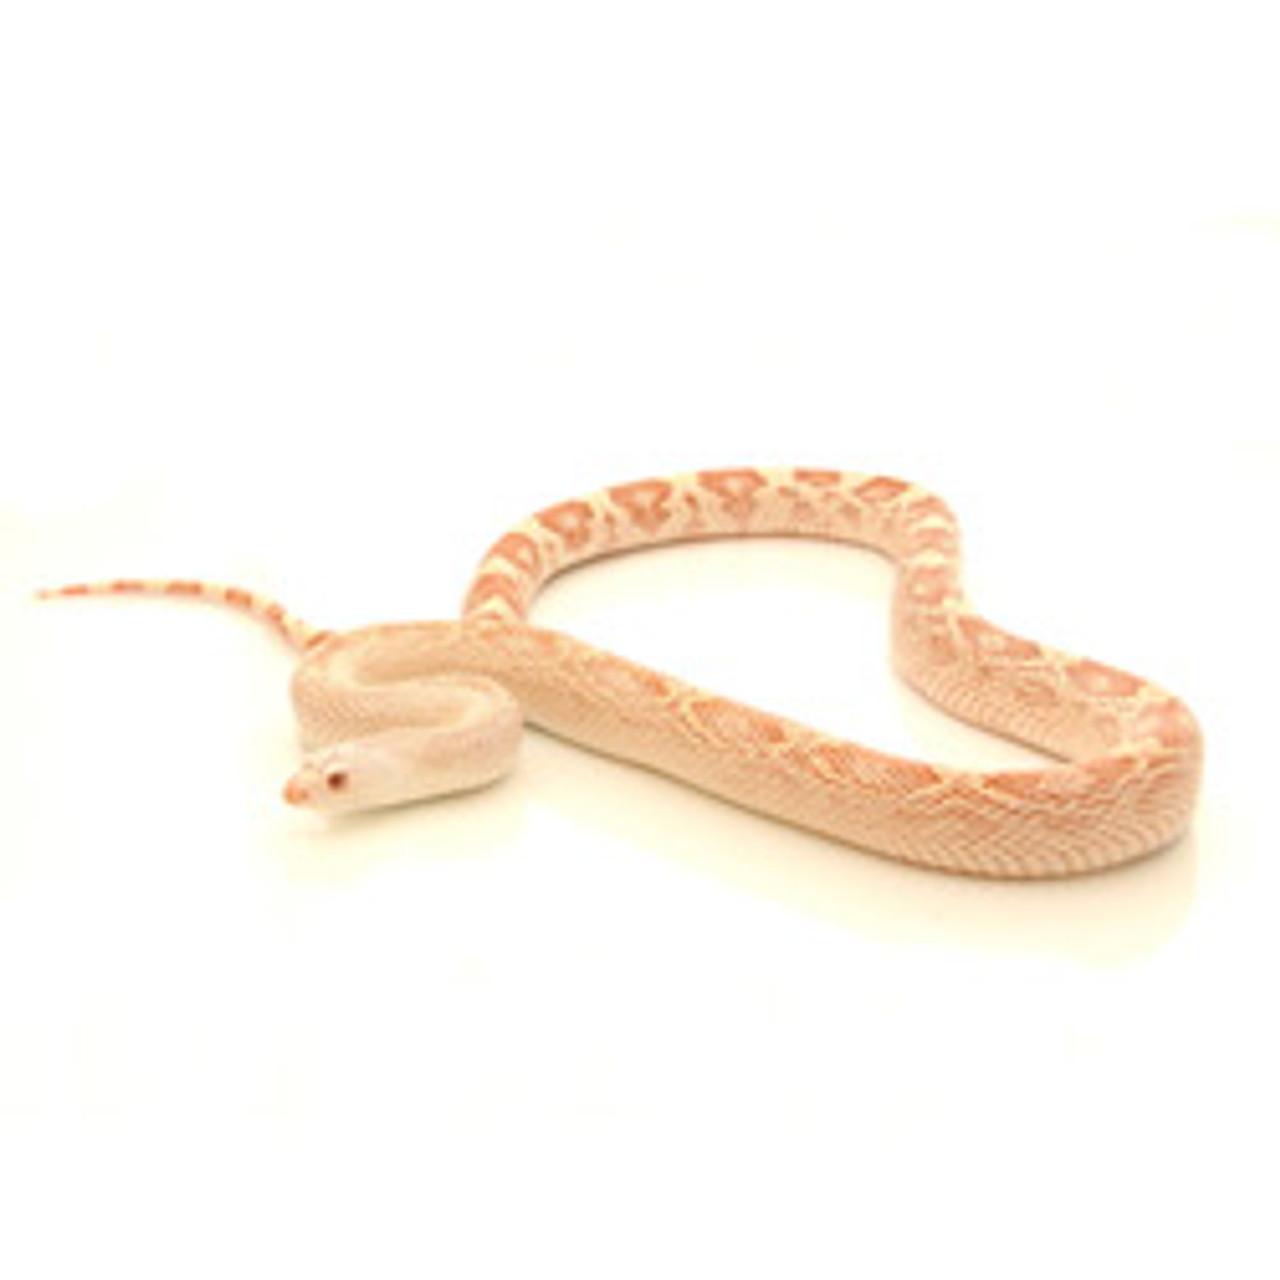 Albino Pine Snake (Pituophis melanoleucus)